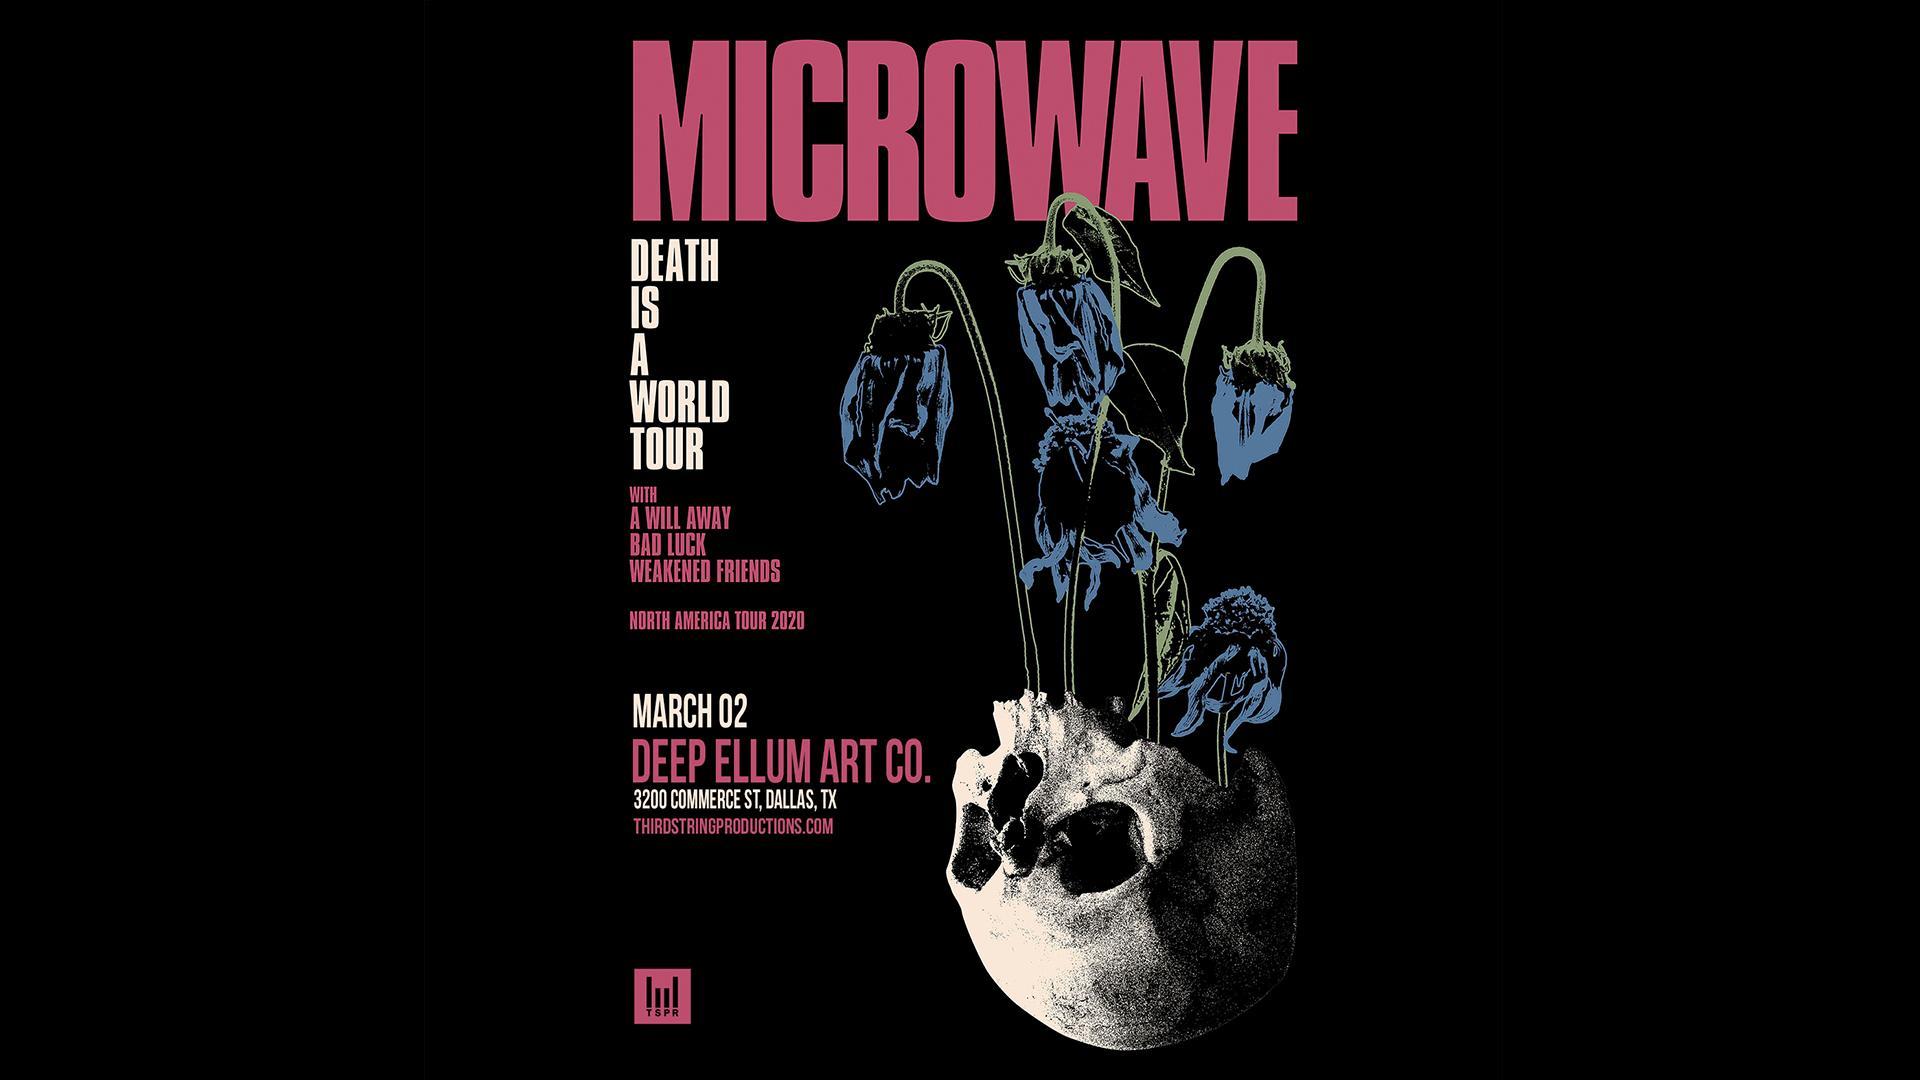 Microwave at Deep Ellum Art Co